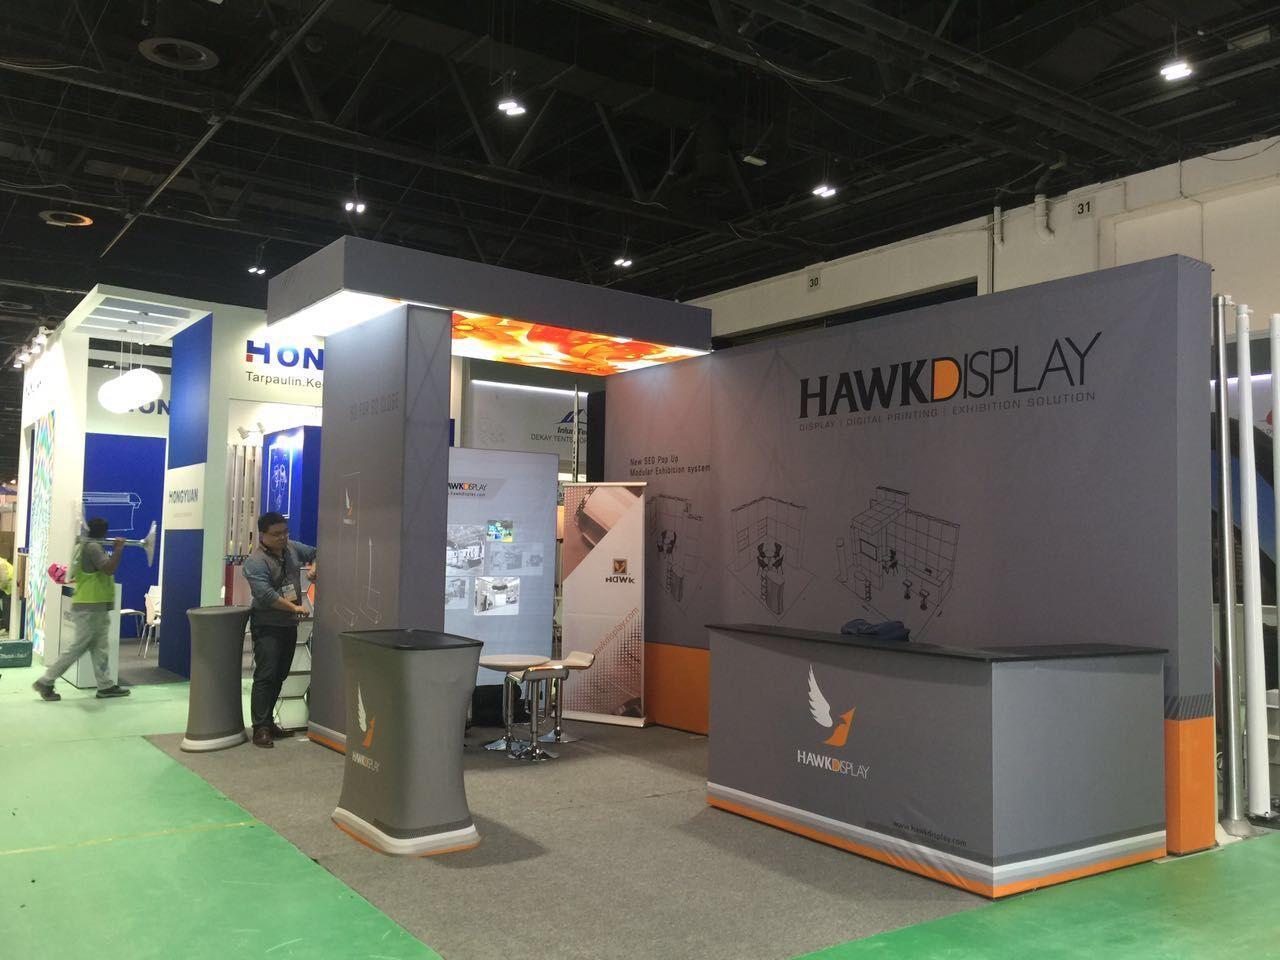 Portable Exhibition Stands In Dubai : Trade show booth of hawk display in past sgi dubai